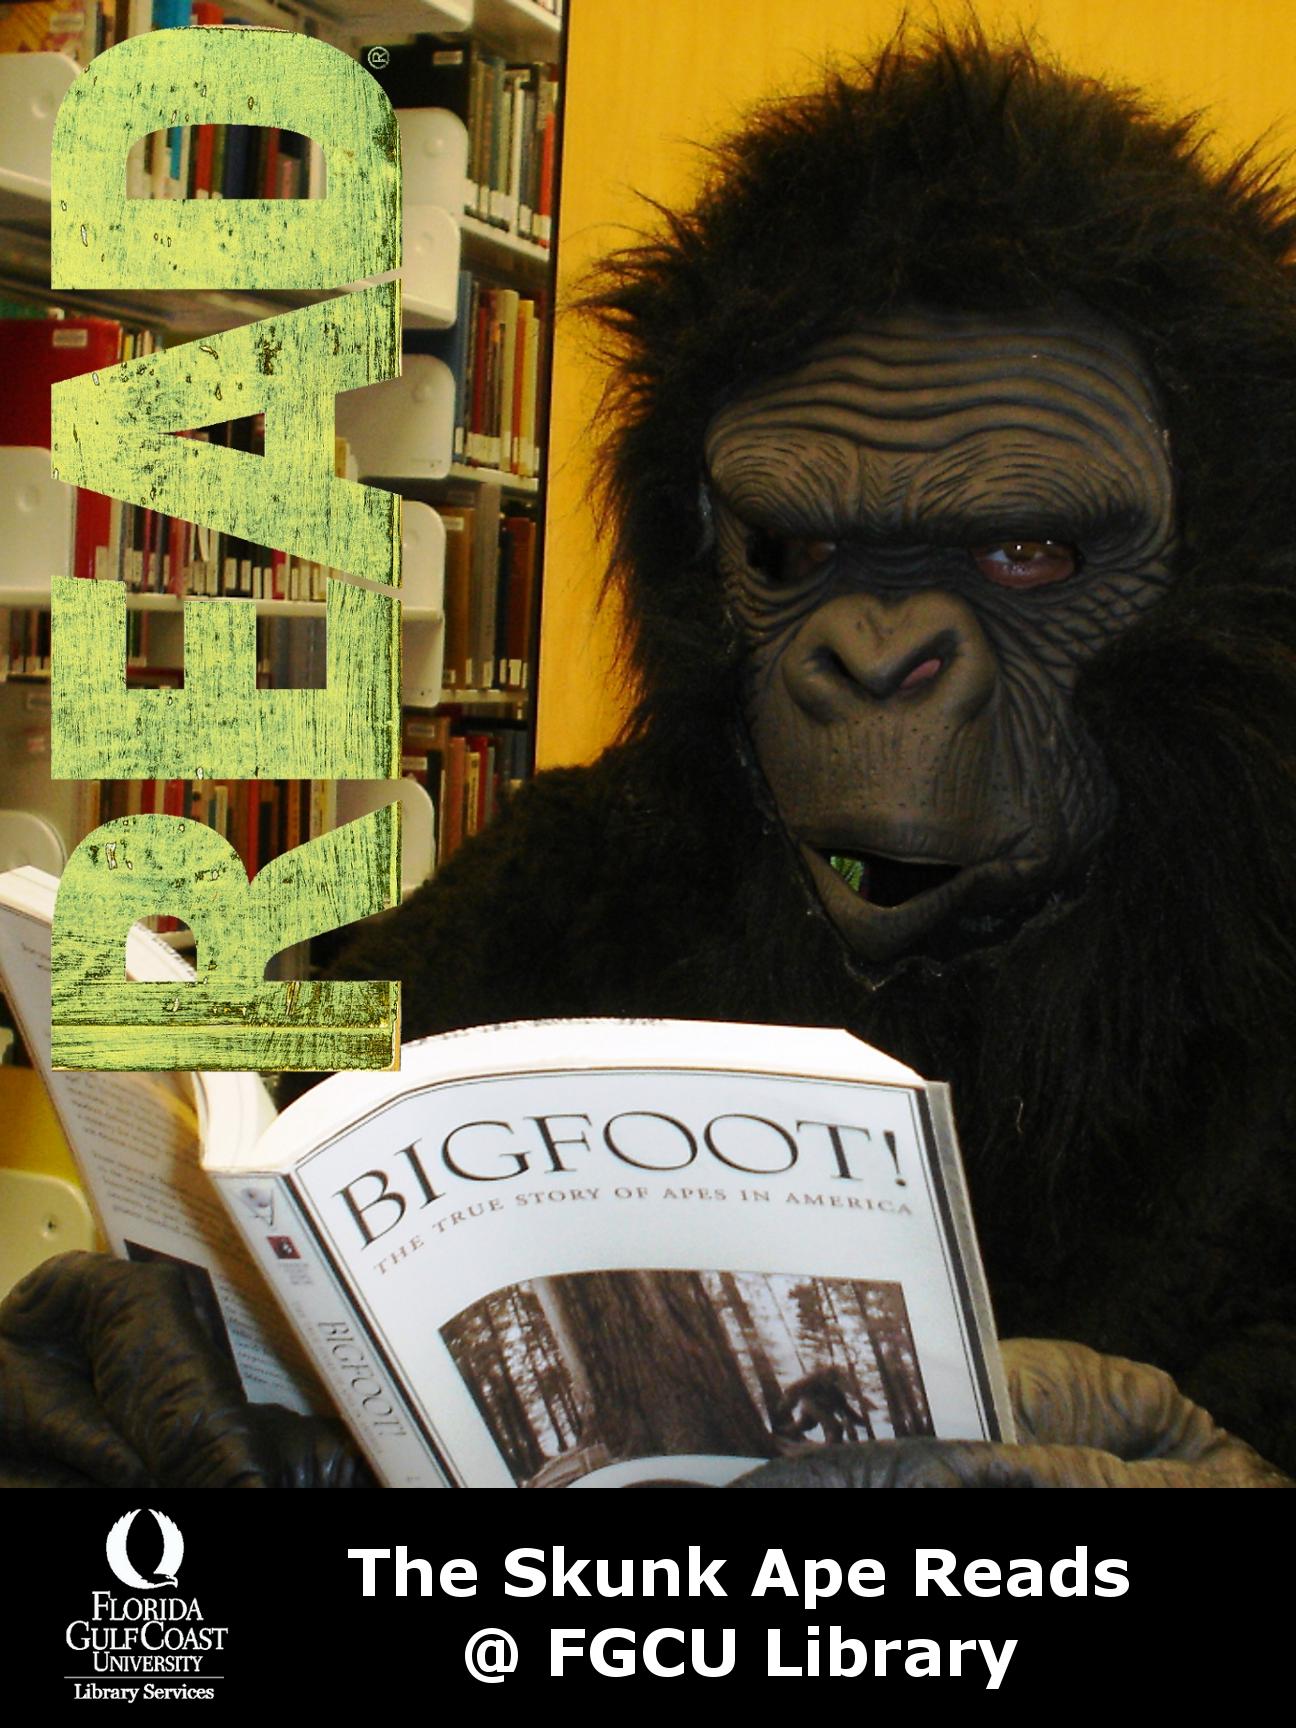 skunk ape reading a book